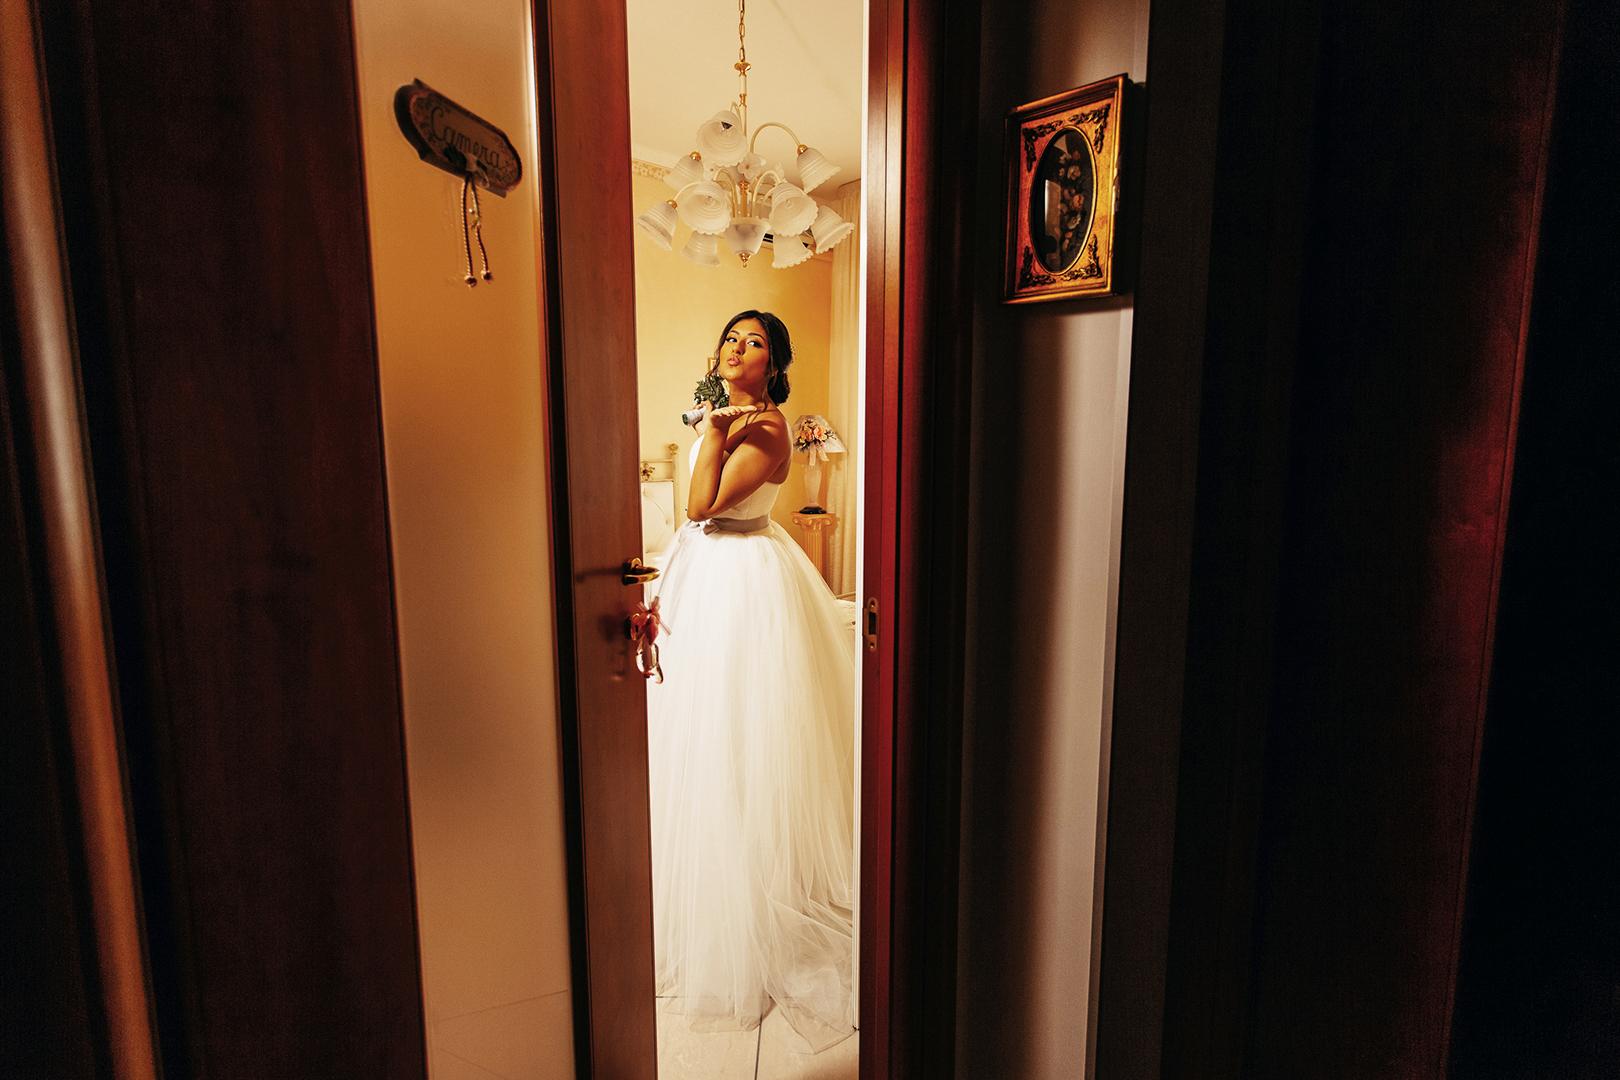 21 gianni-lepore-sposa-casa-bacio